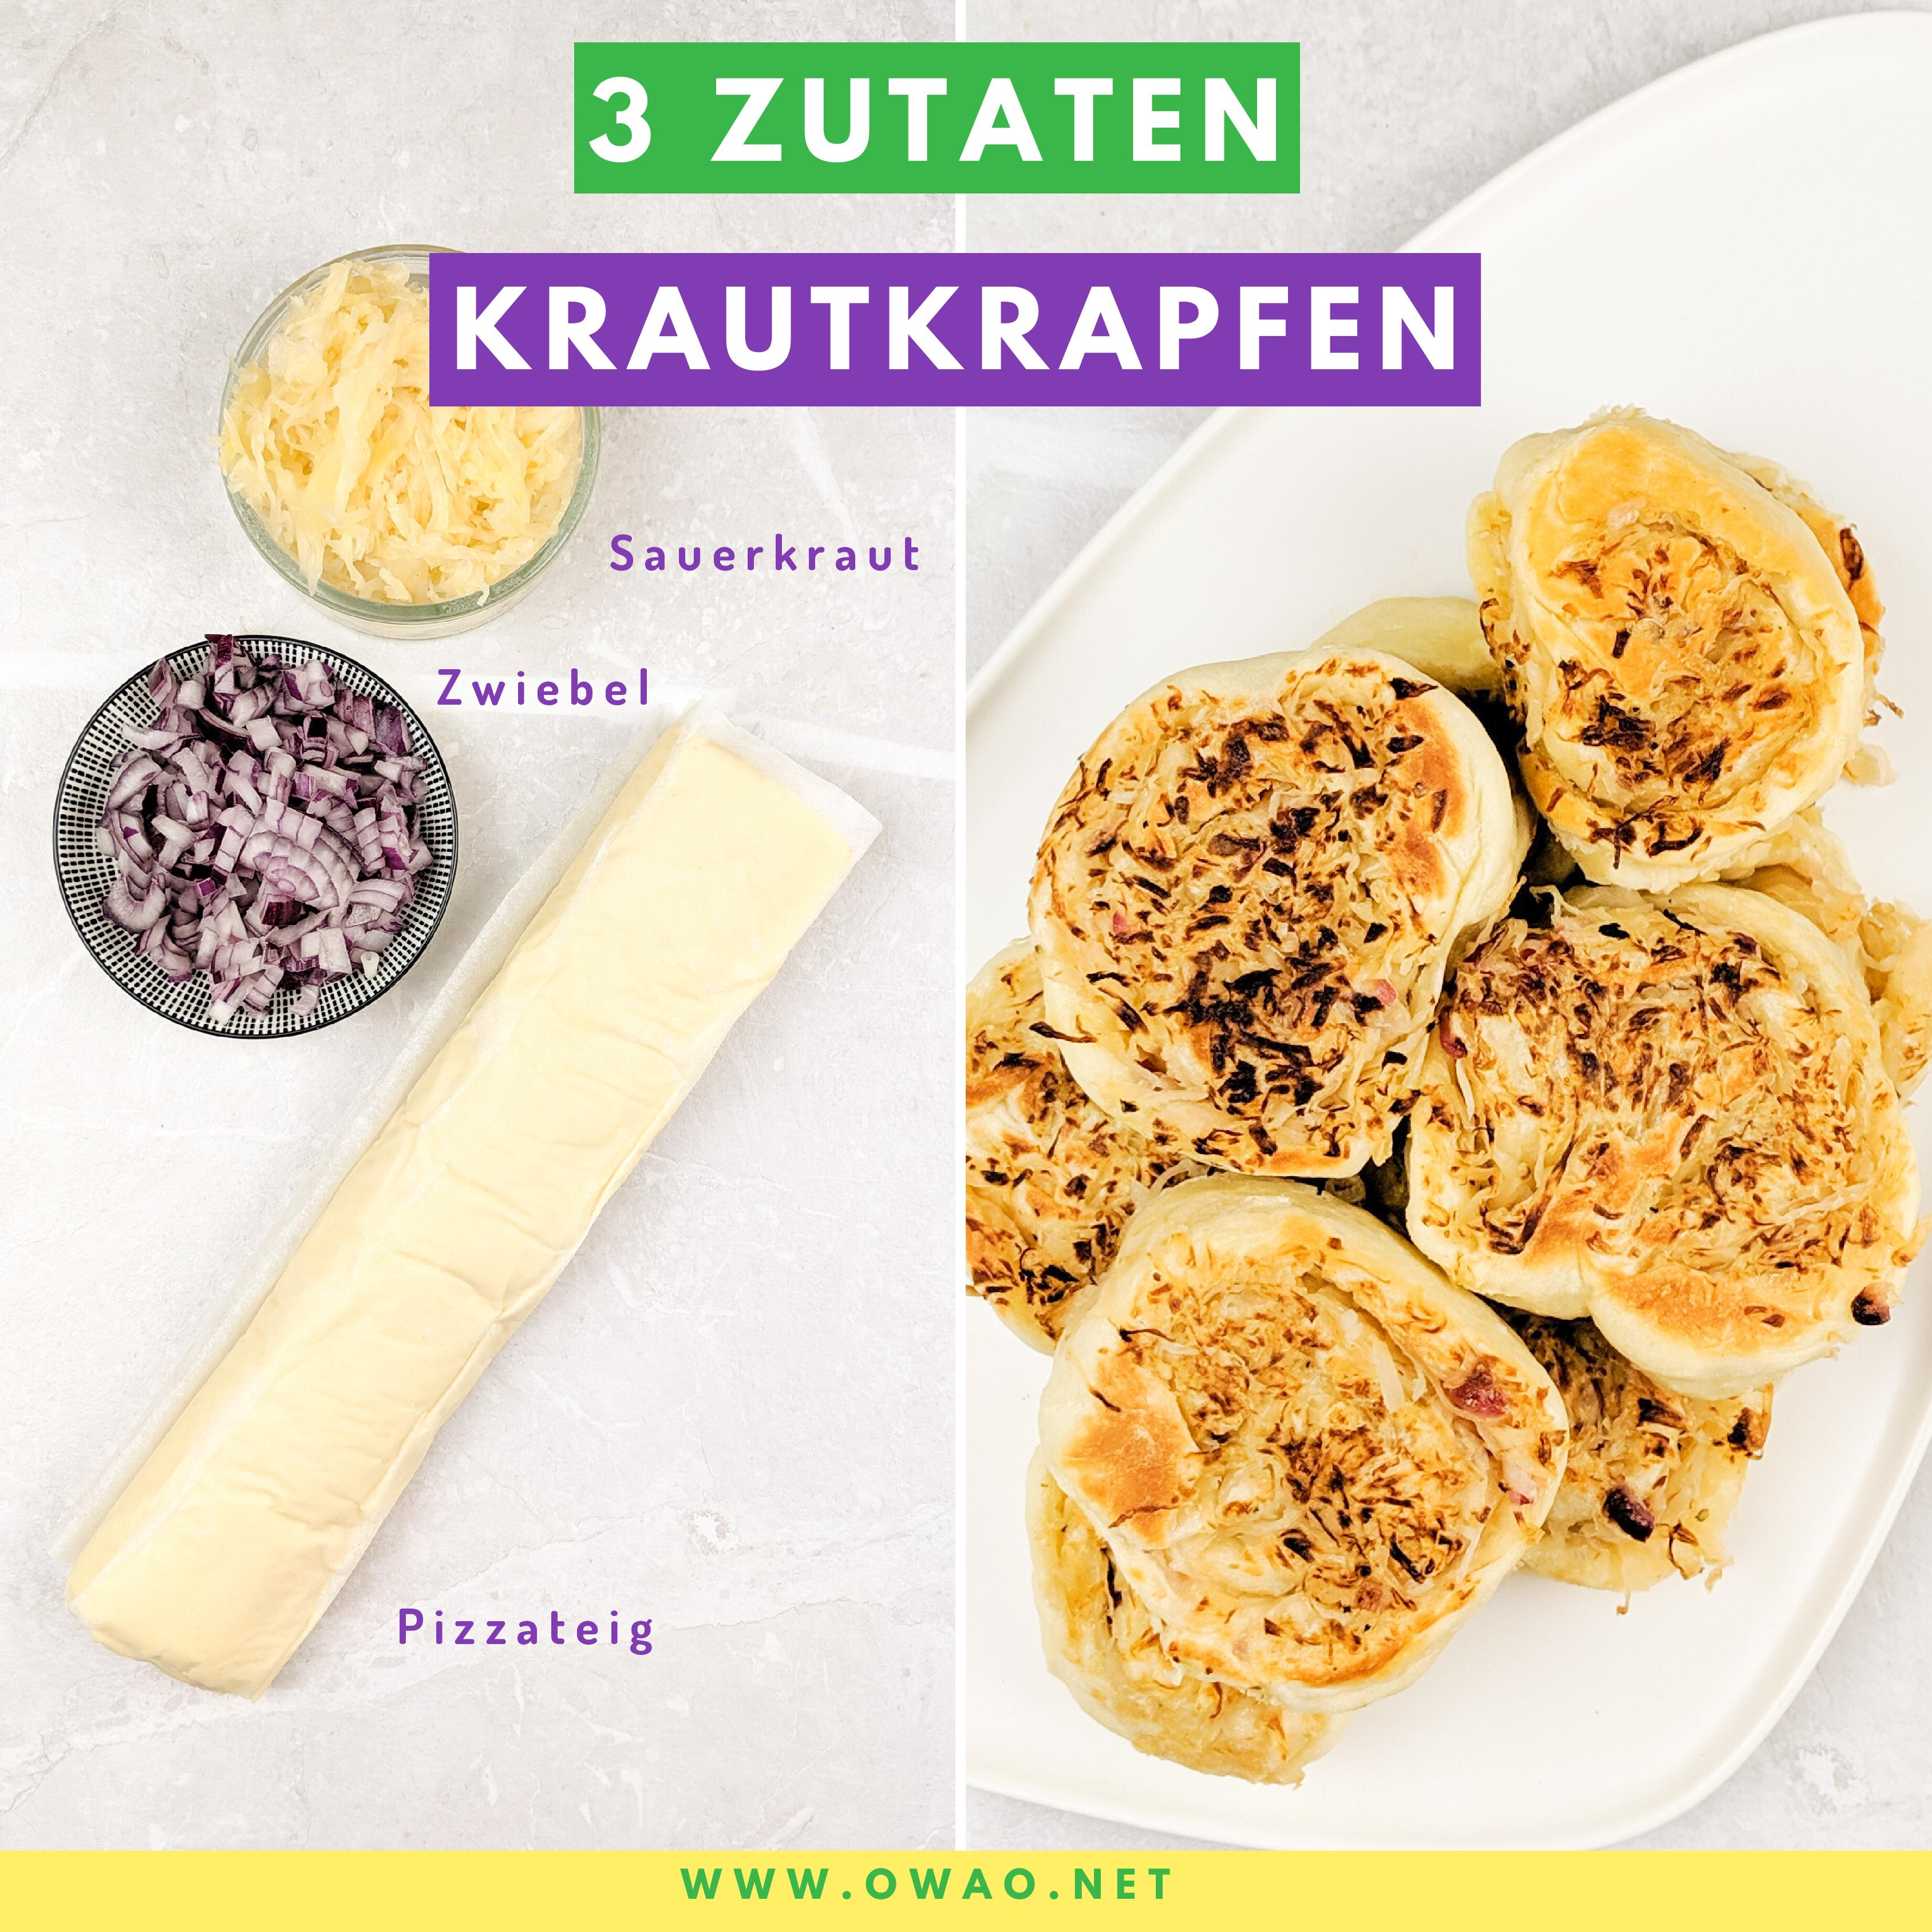 Sauerkraut-Rezept-OWAO!-Ernährung für Vielbeschäfigte-Meal Prep